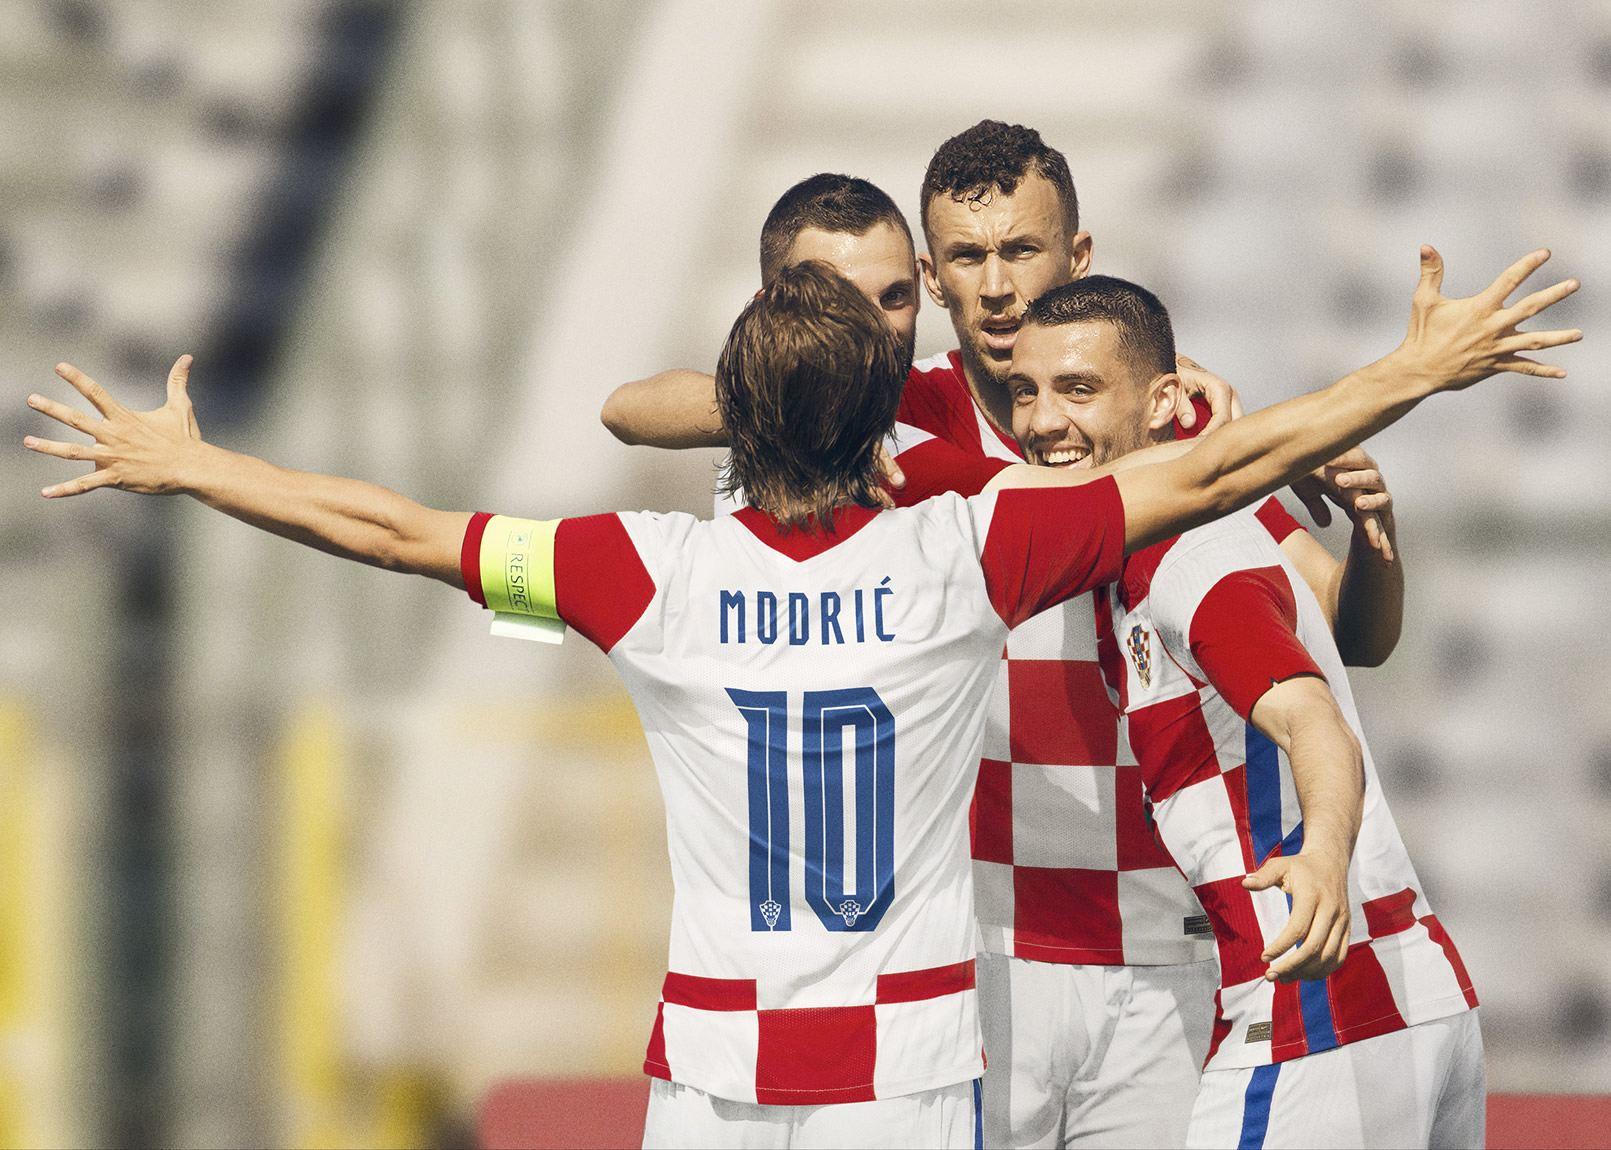 Camiseta titular de Croacia 2020/2021 | Imagen Nike